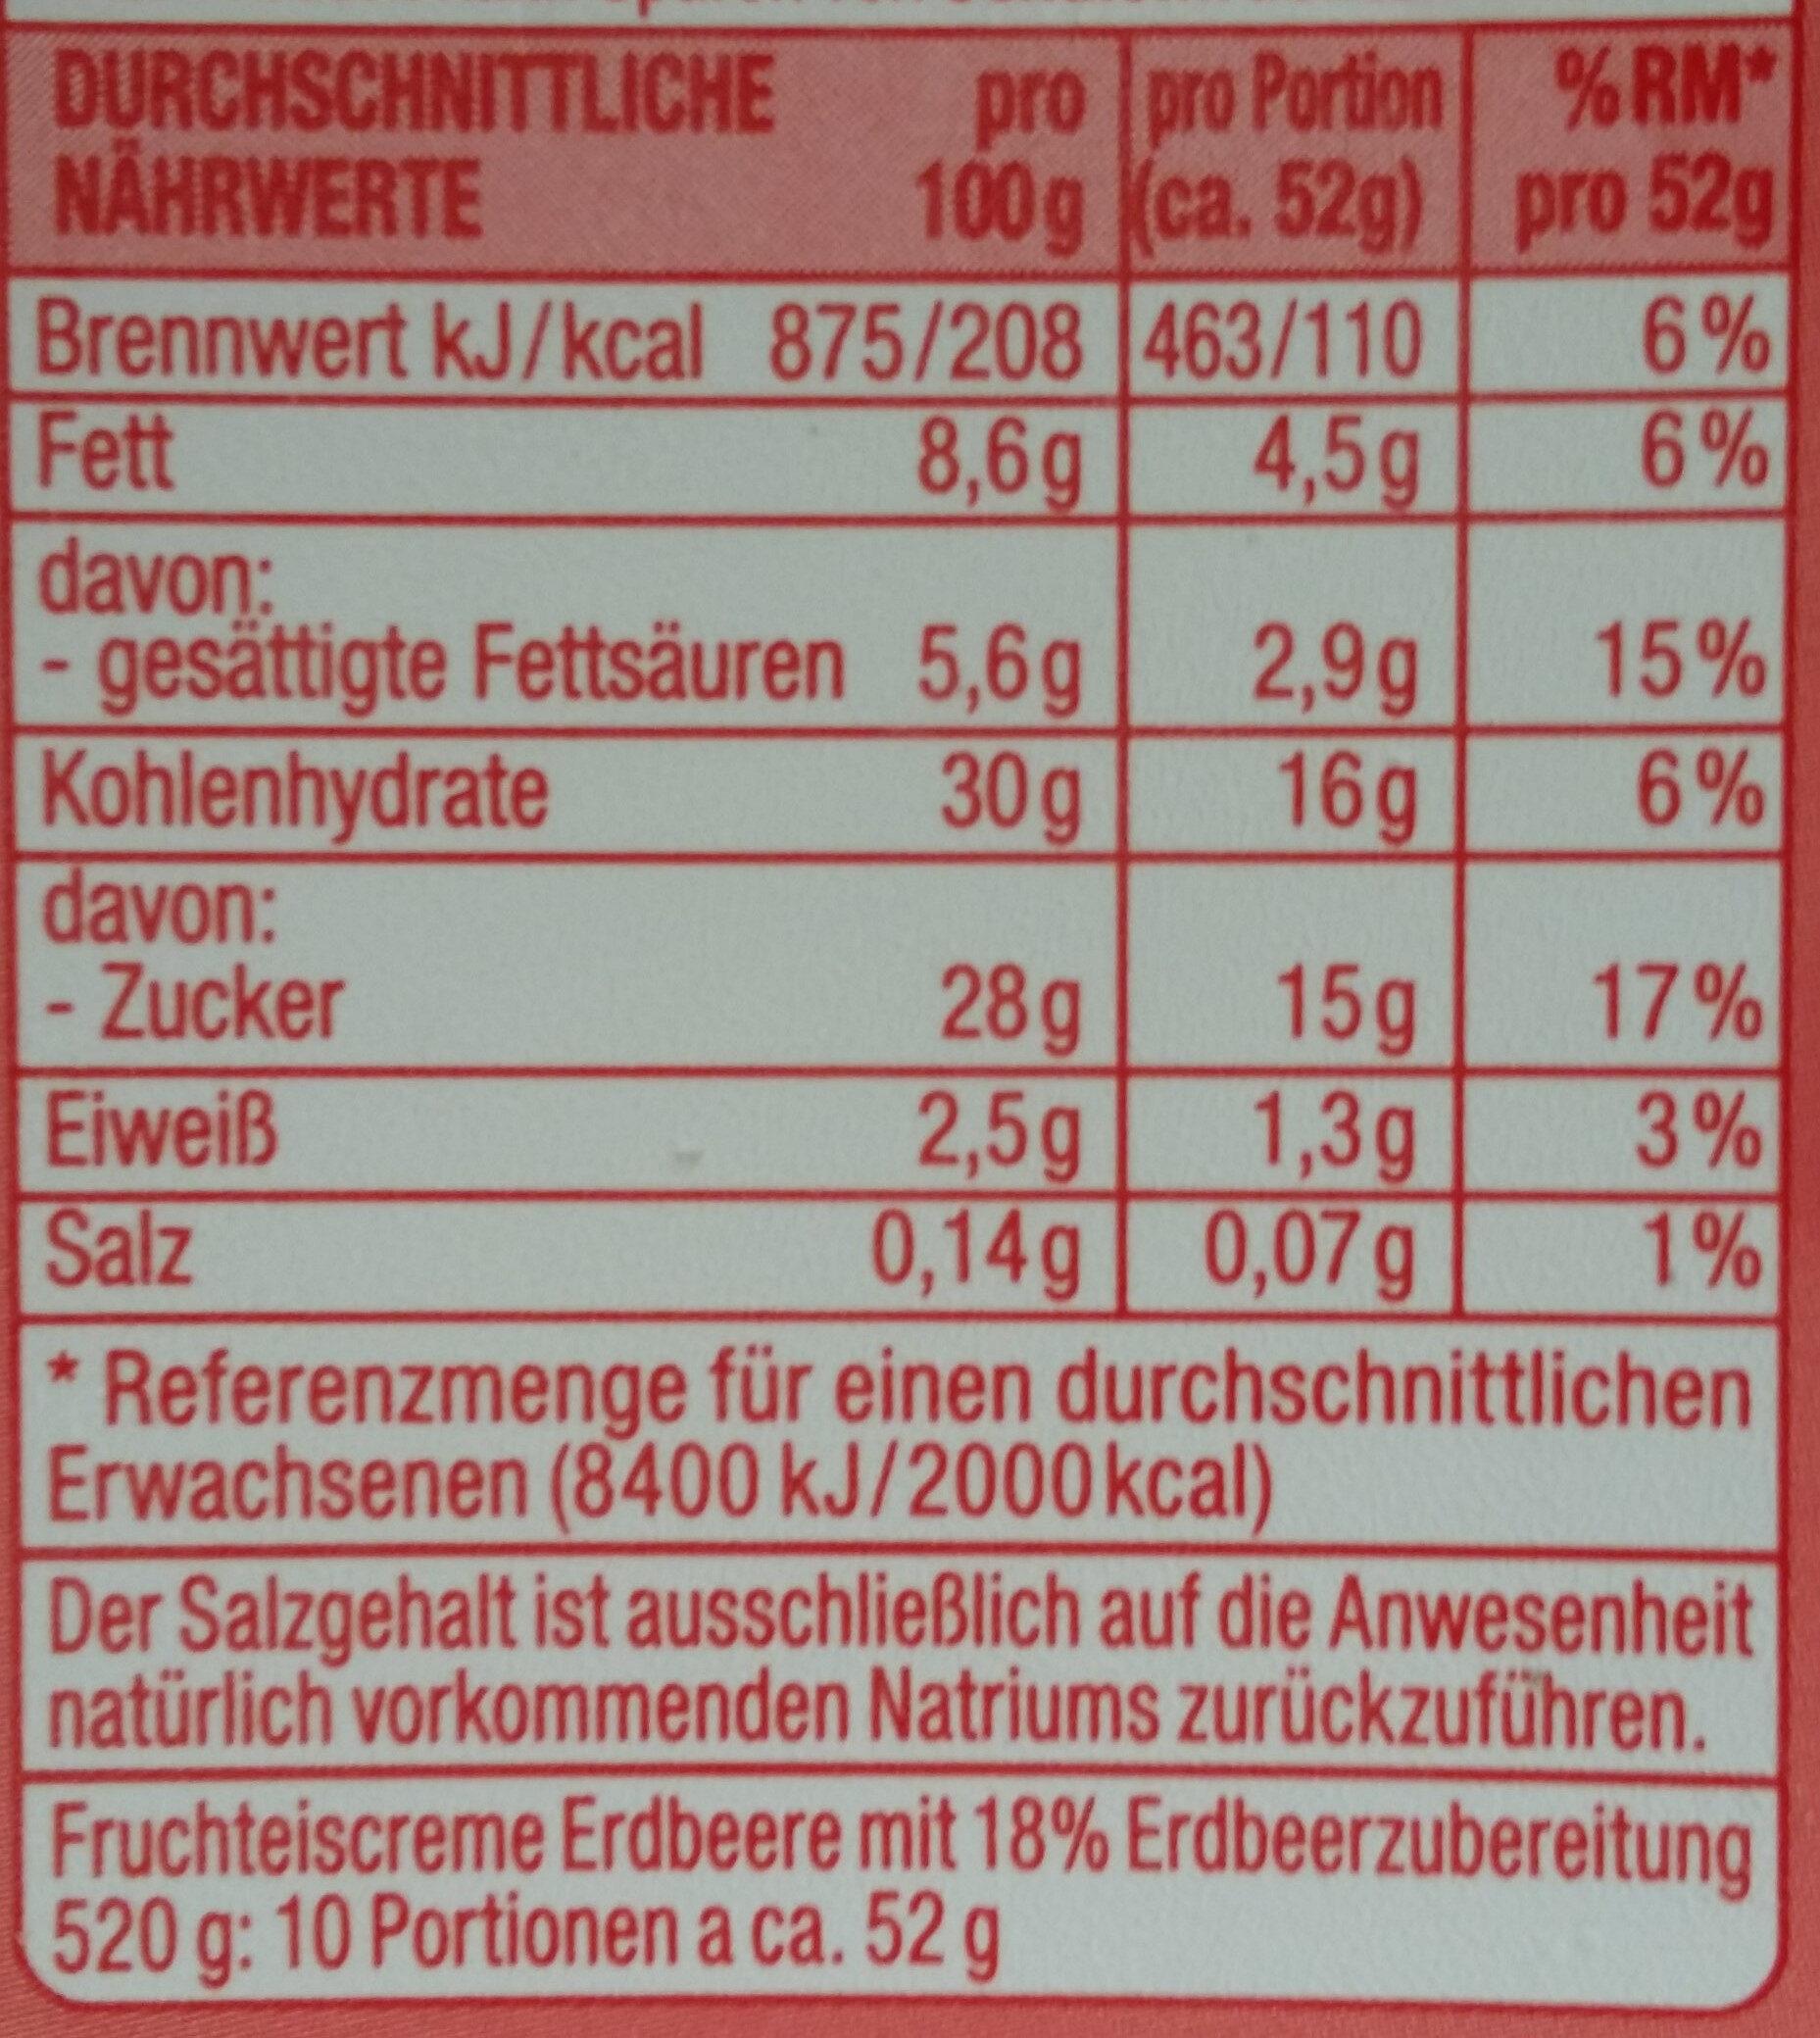 Fruchteiscreme Erdbeere - Nutrition facts - de